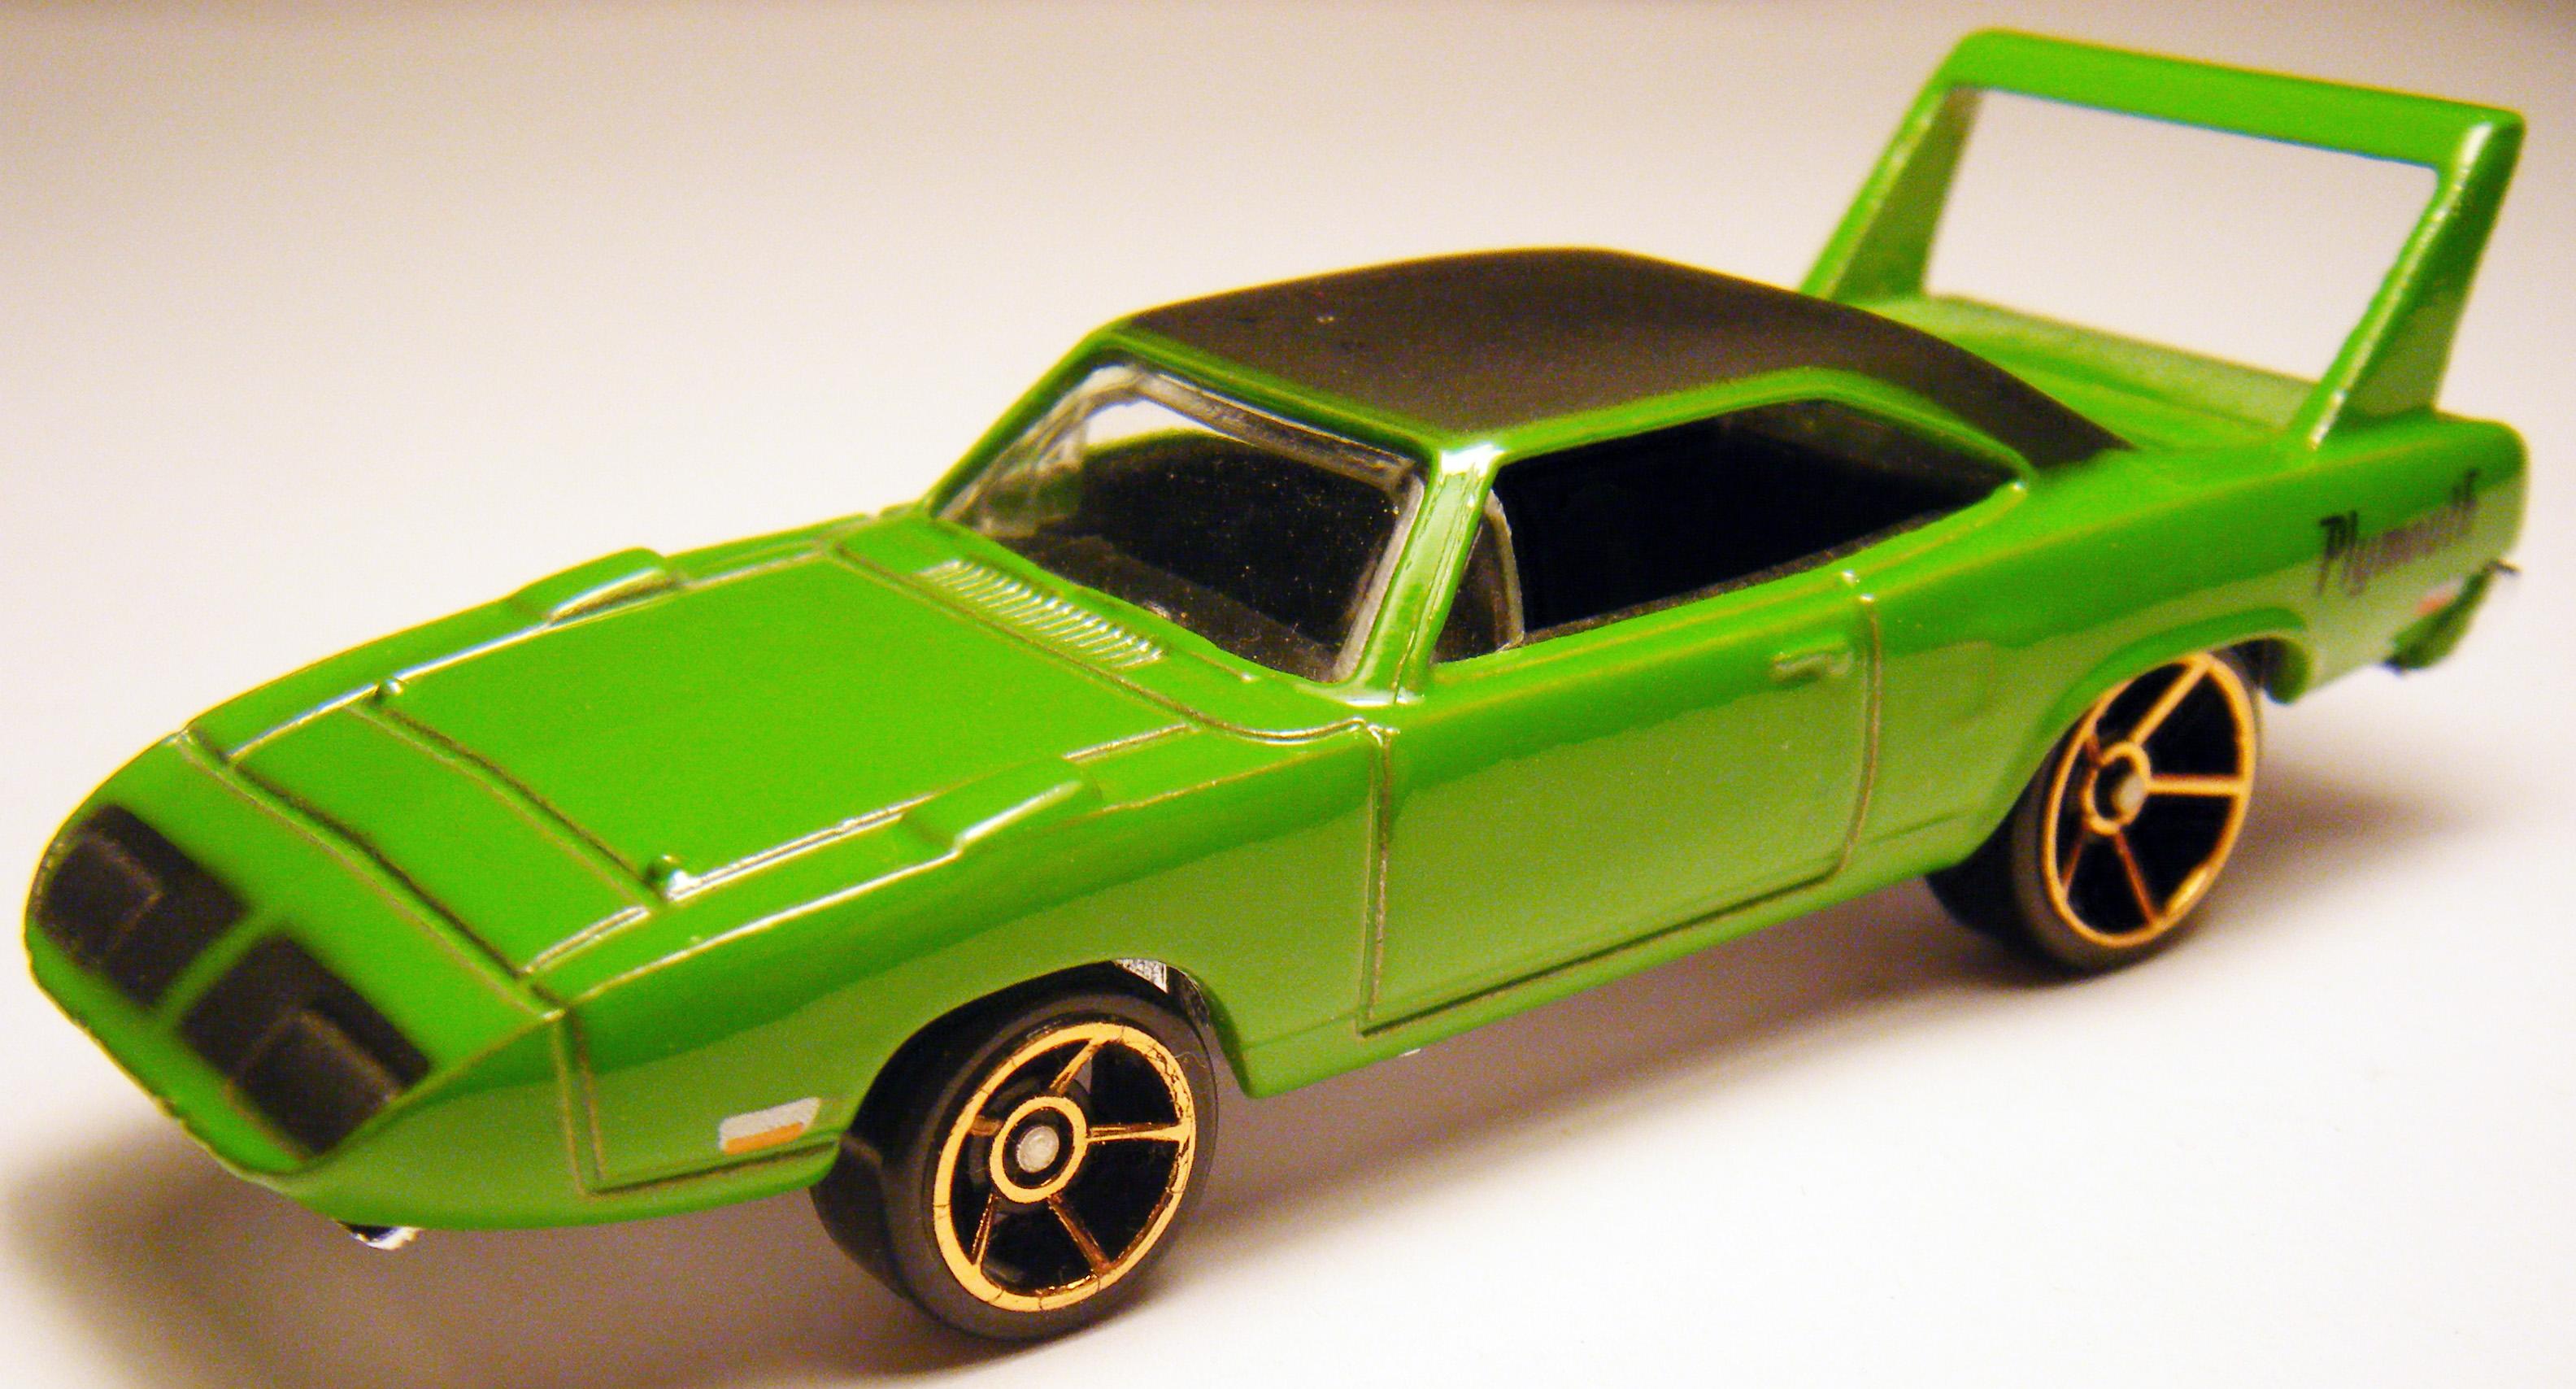 List of 2006 Hot Wheels